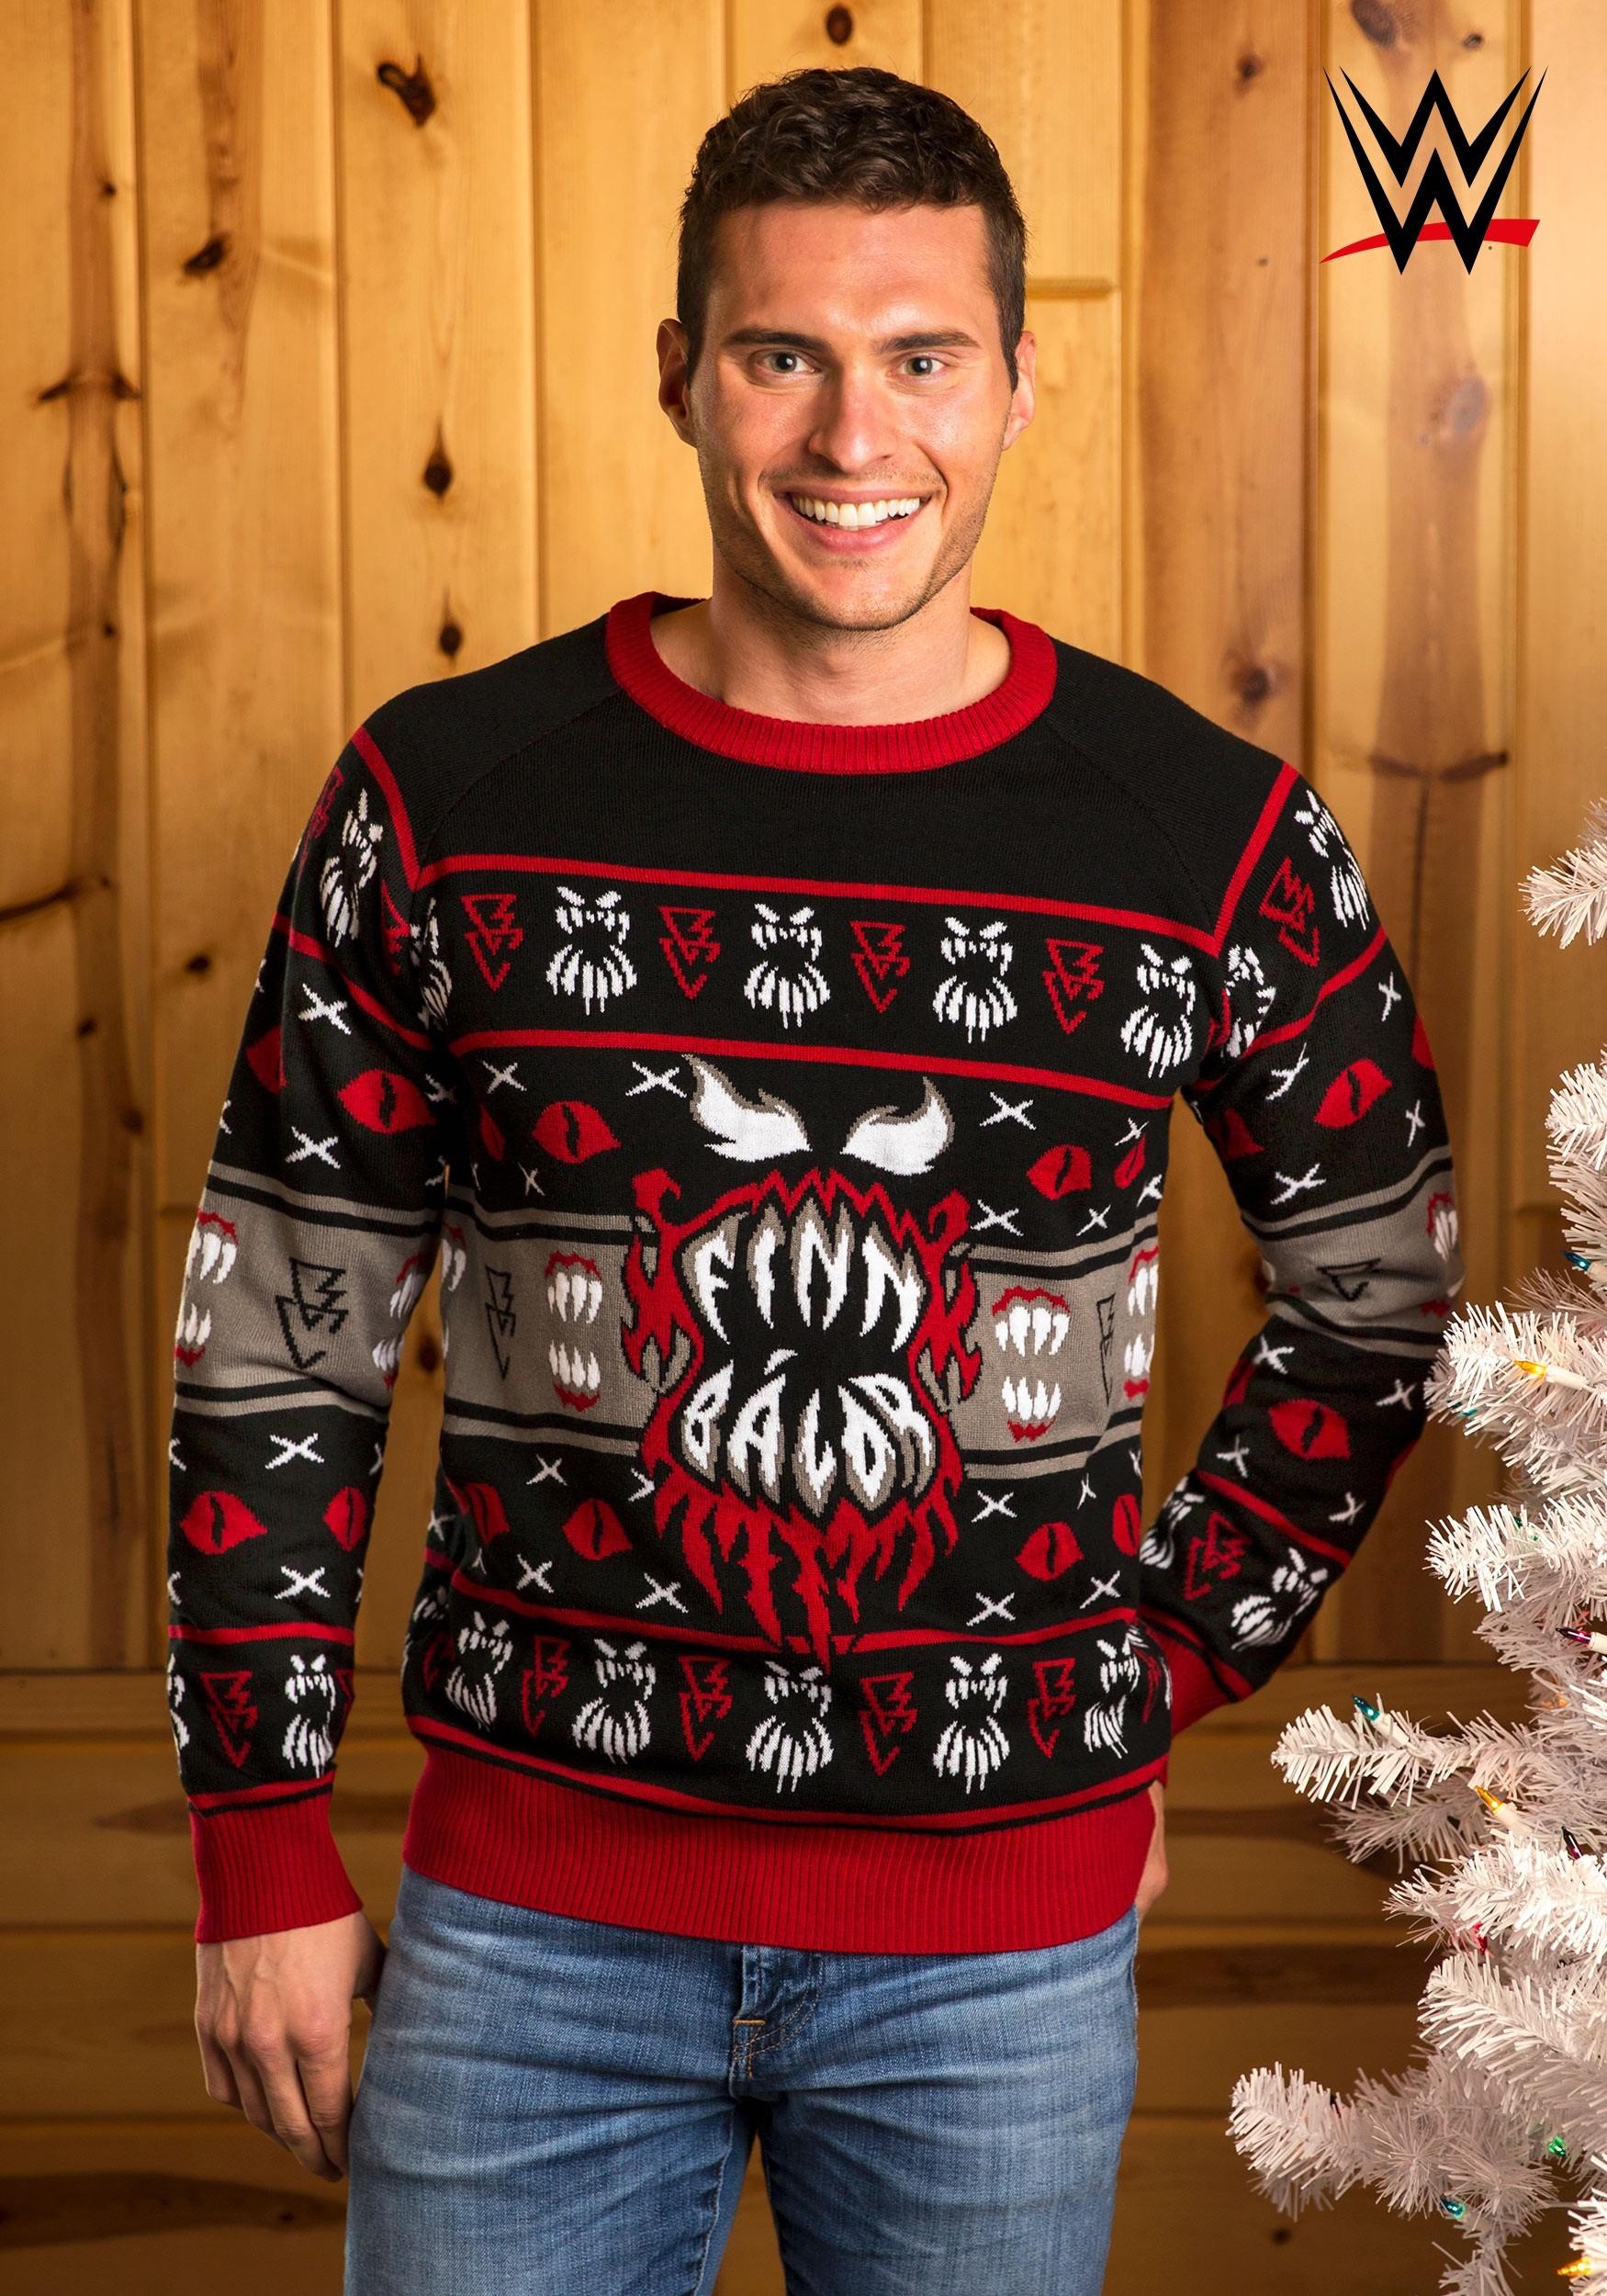 Christmas Cardigan Sweaters.Wwe Finn Balor Ugly Christmas Sweater